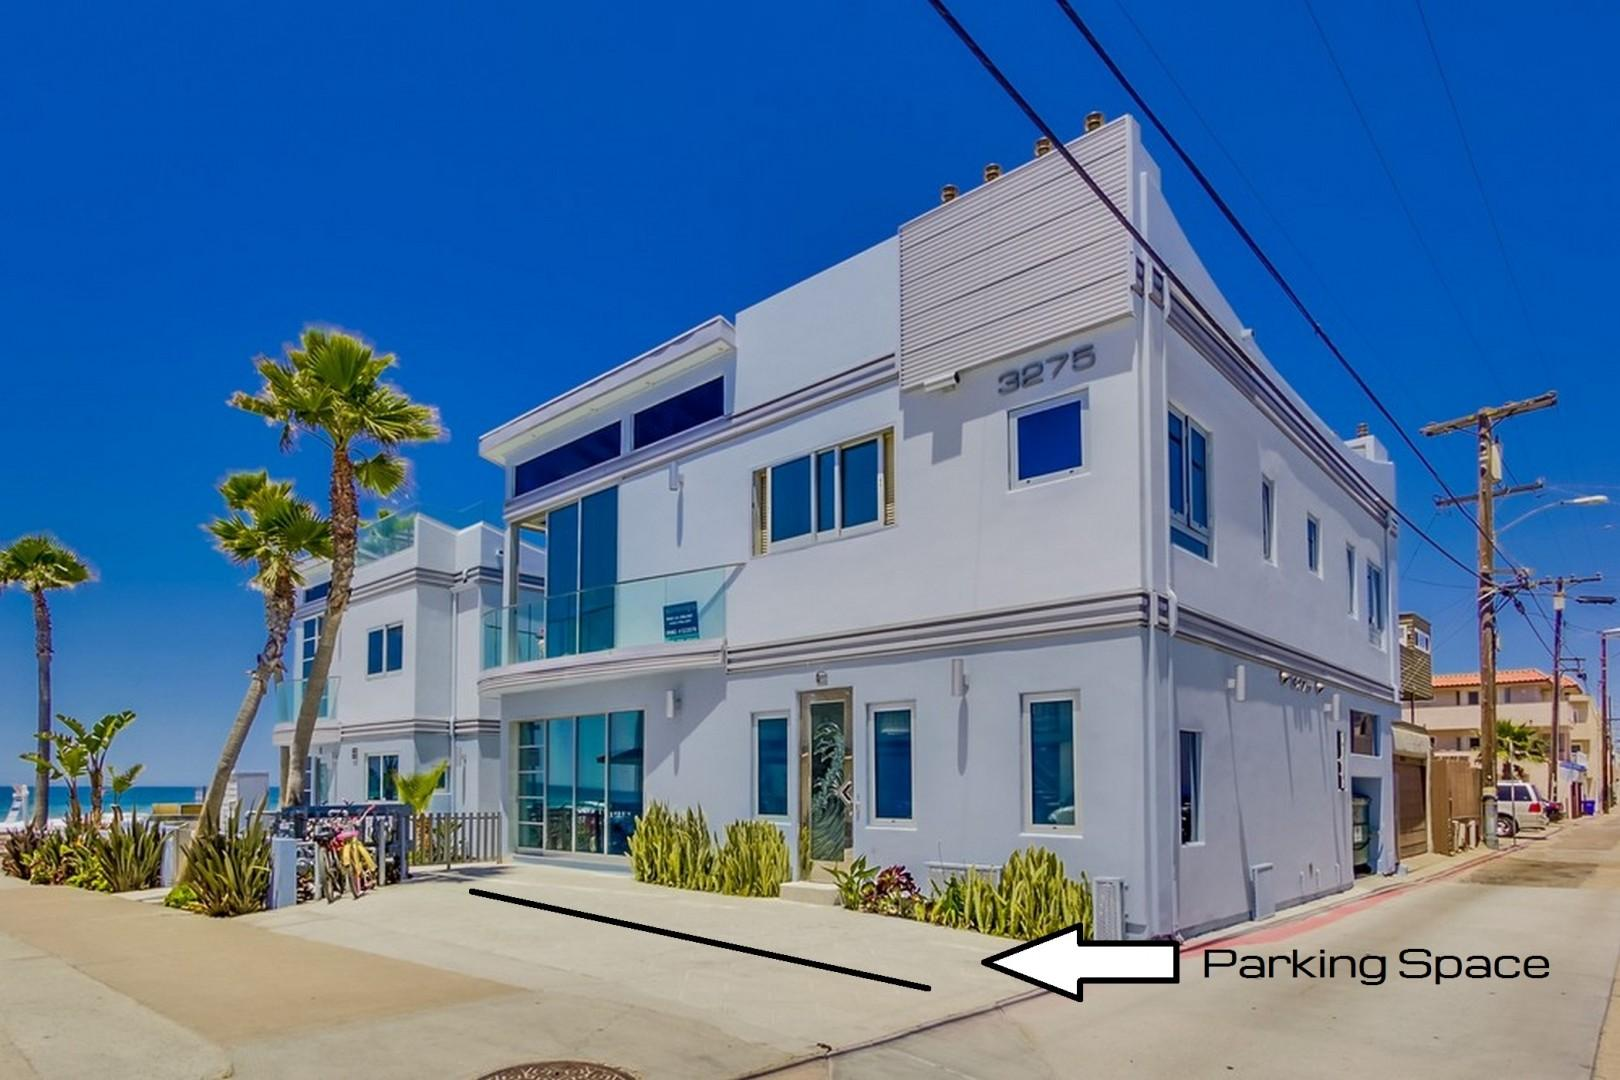 3275-ocean-front-walk-1-027_web_Parking